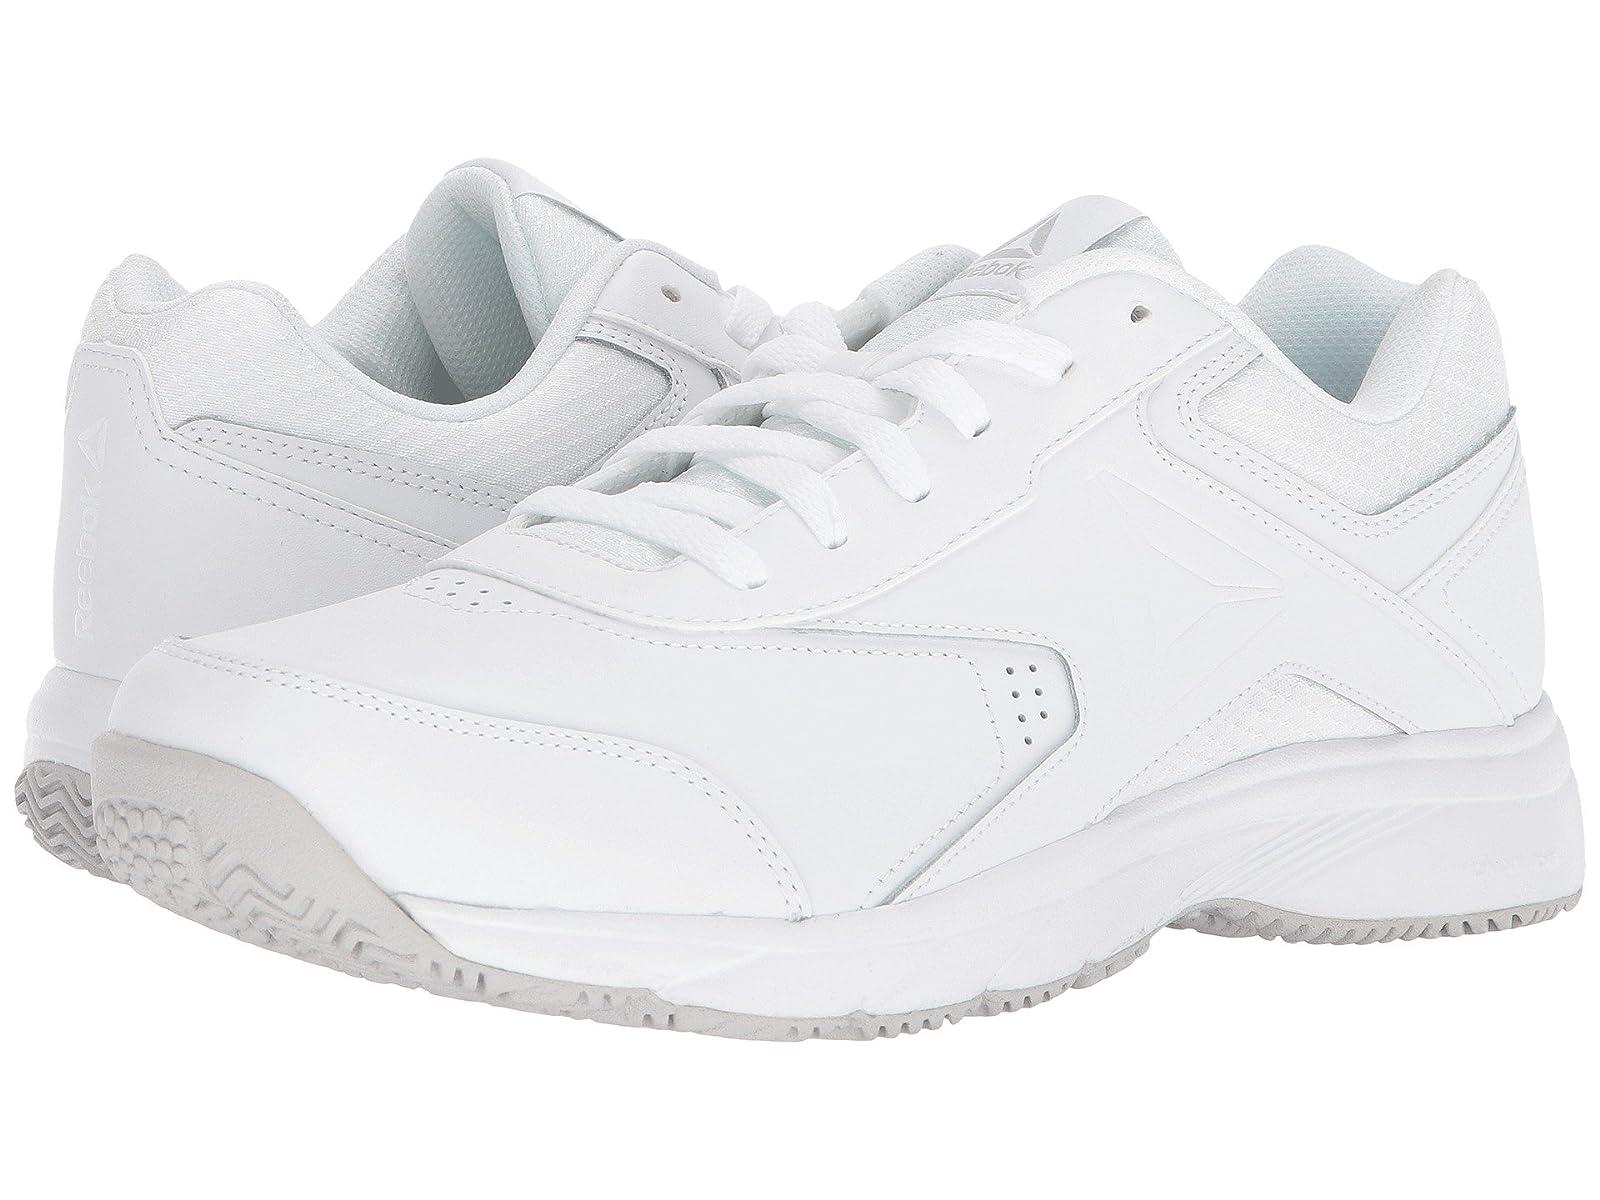 Reebok Work N Cushion 3.0Cheap and distinctive eye-catching shoes